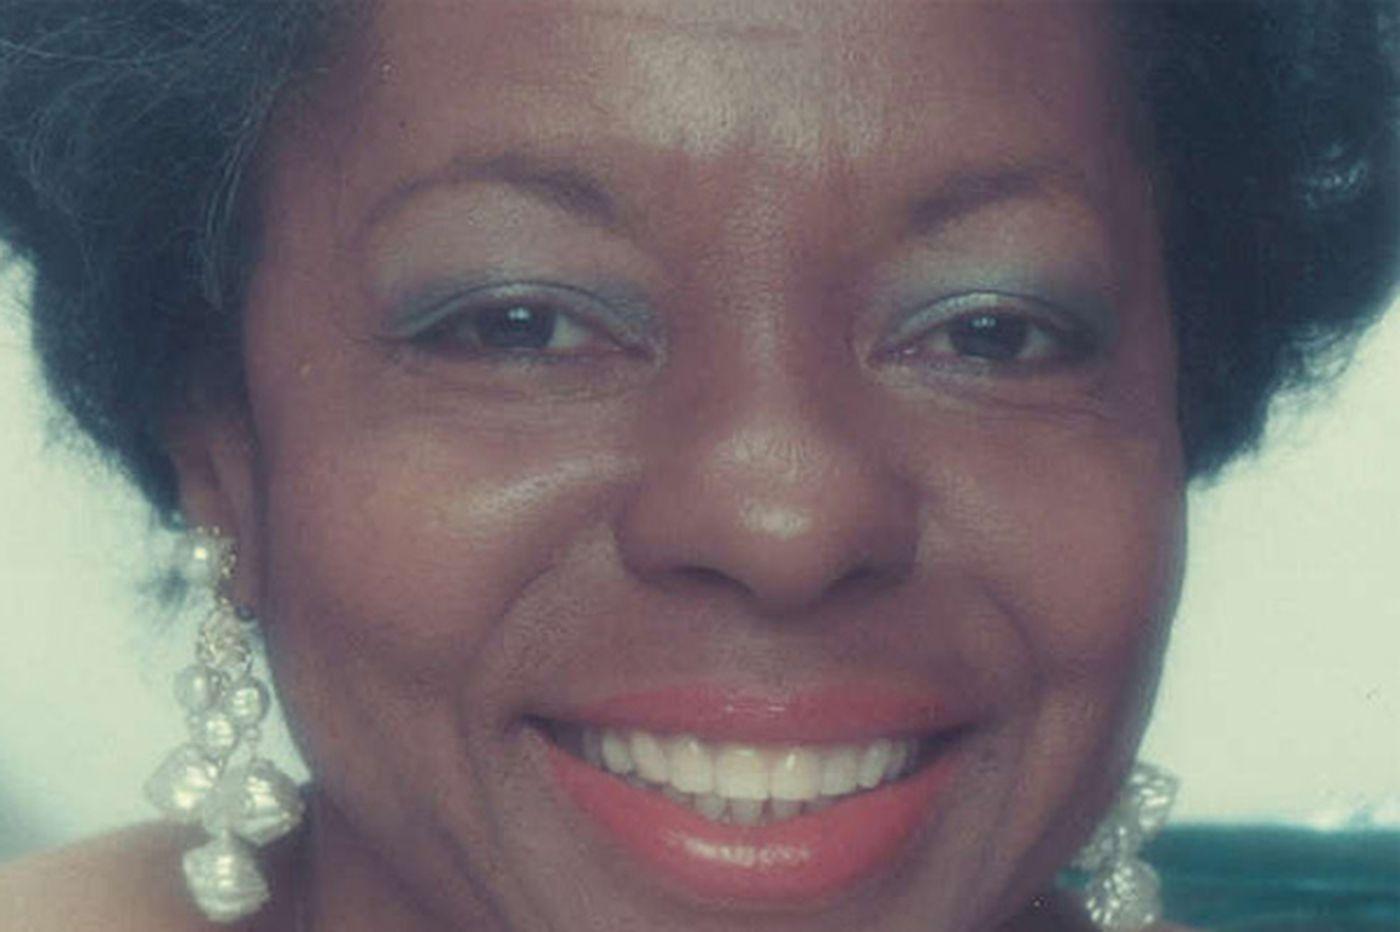 Barbara Stewart, 76, VA Hospital administrator